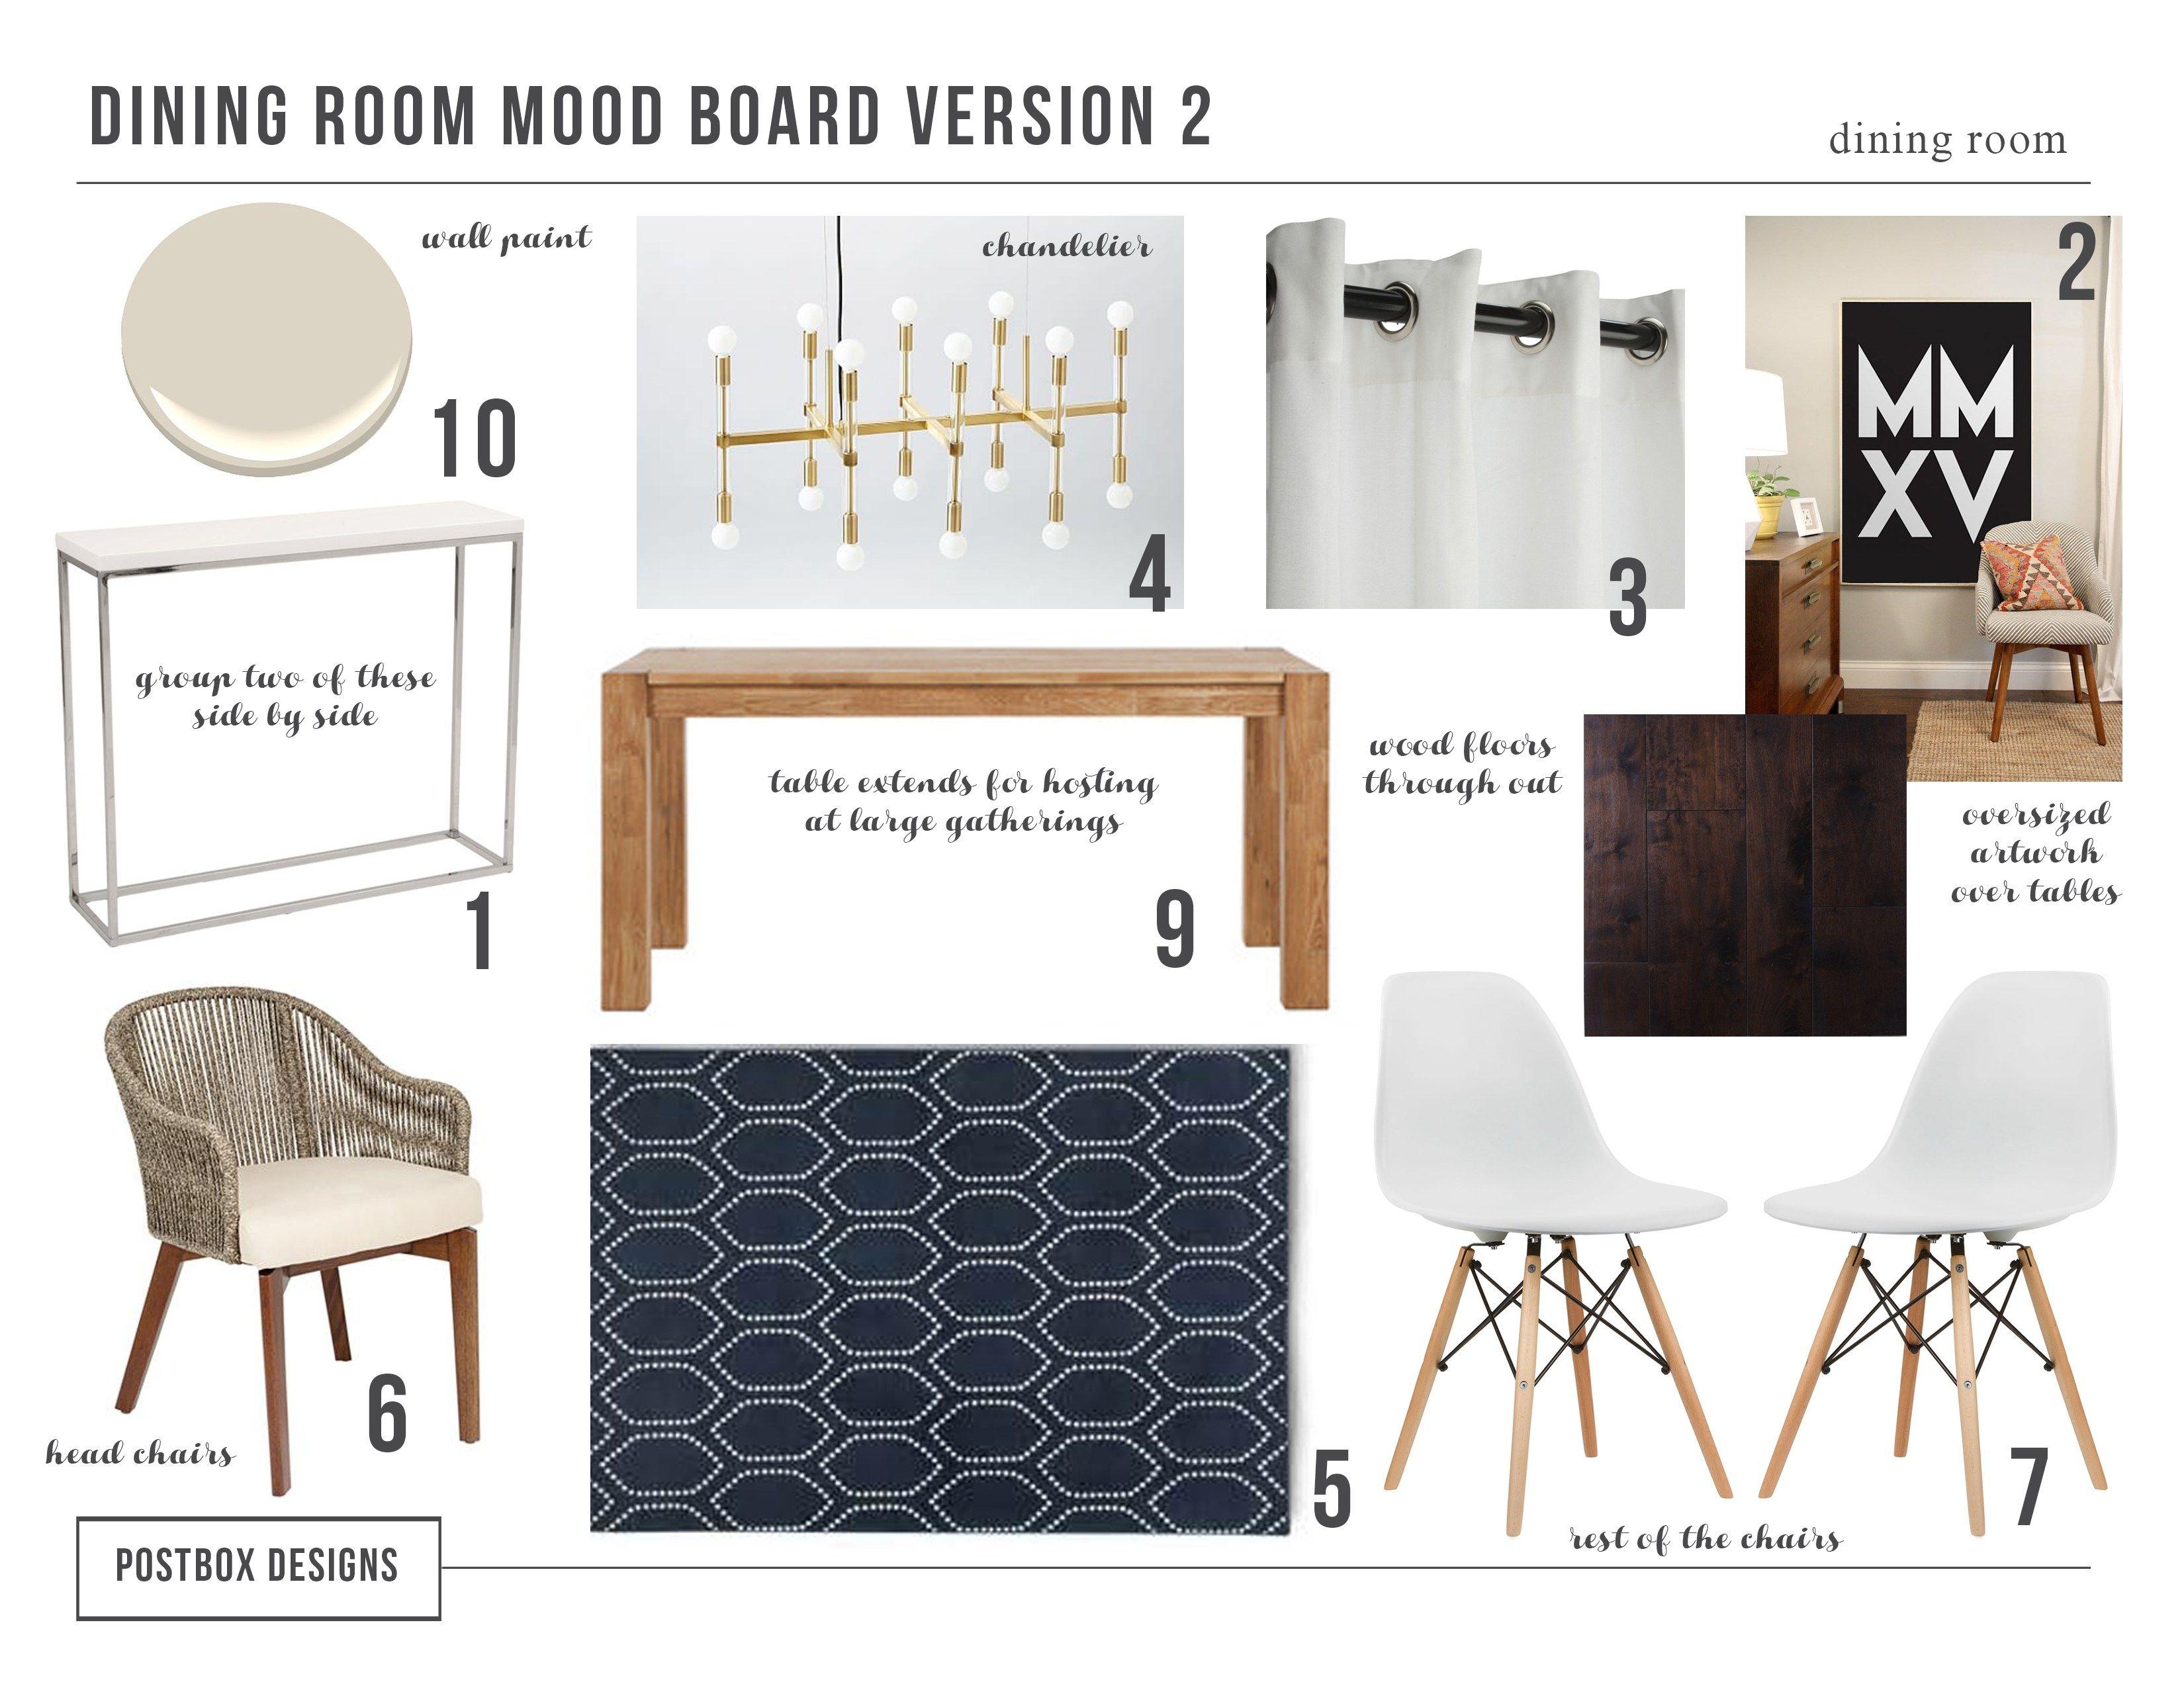 Modern Dining Room Makeover By Postbox Designs, Modern Dining Room Mood  Board, West Elm